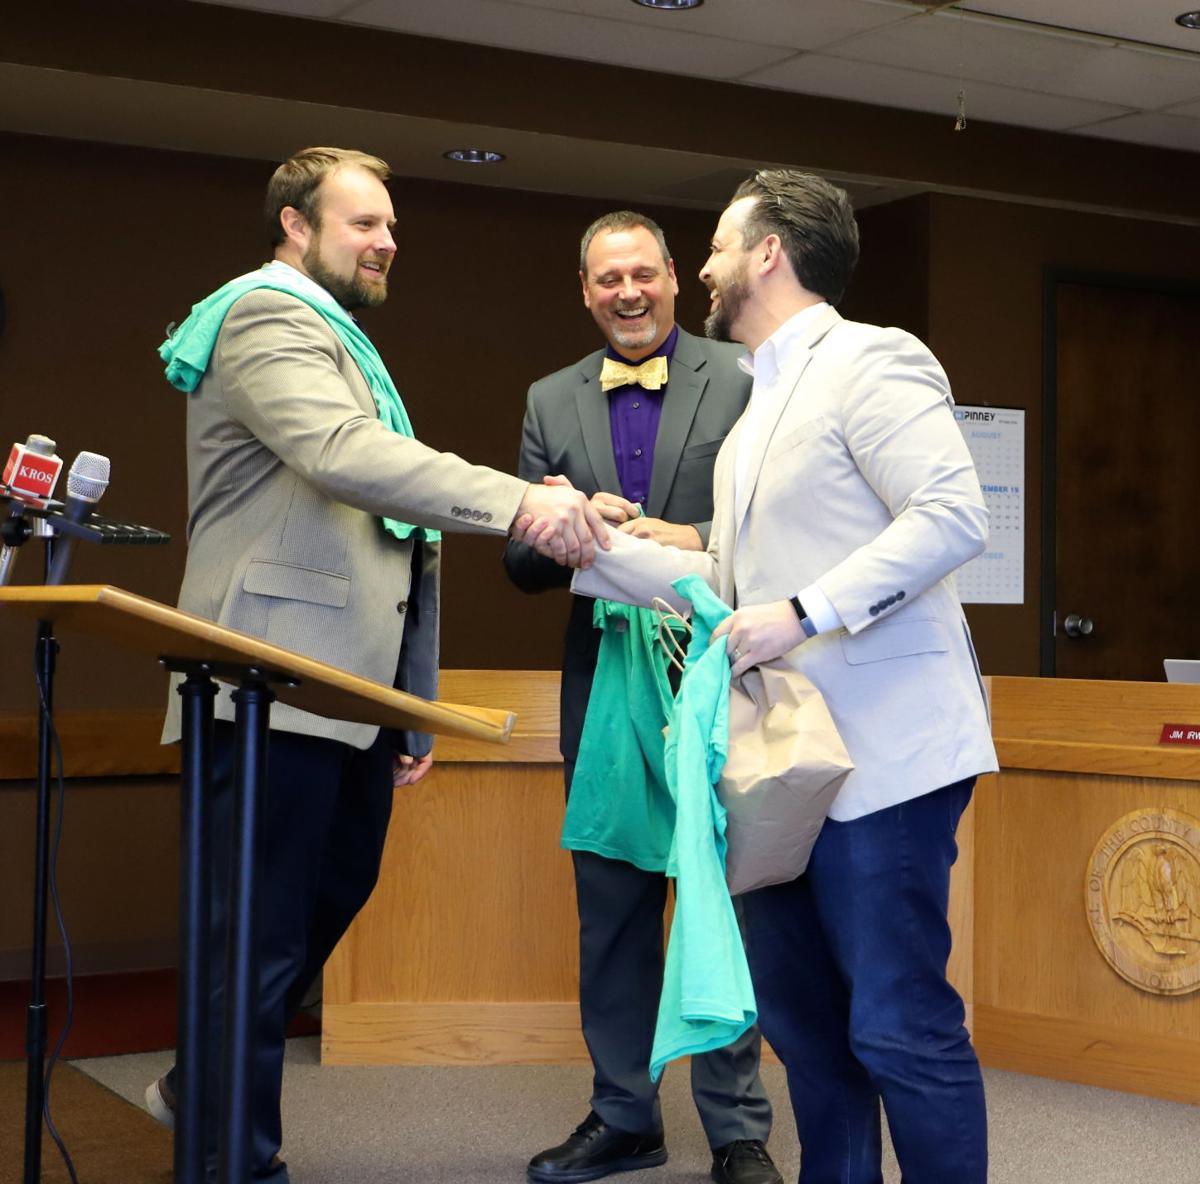 Andy Sokolovich, Eric Van Lancker and David Aronson of Peanut Butter